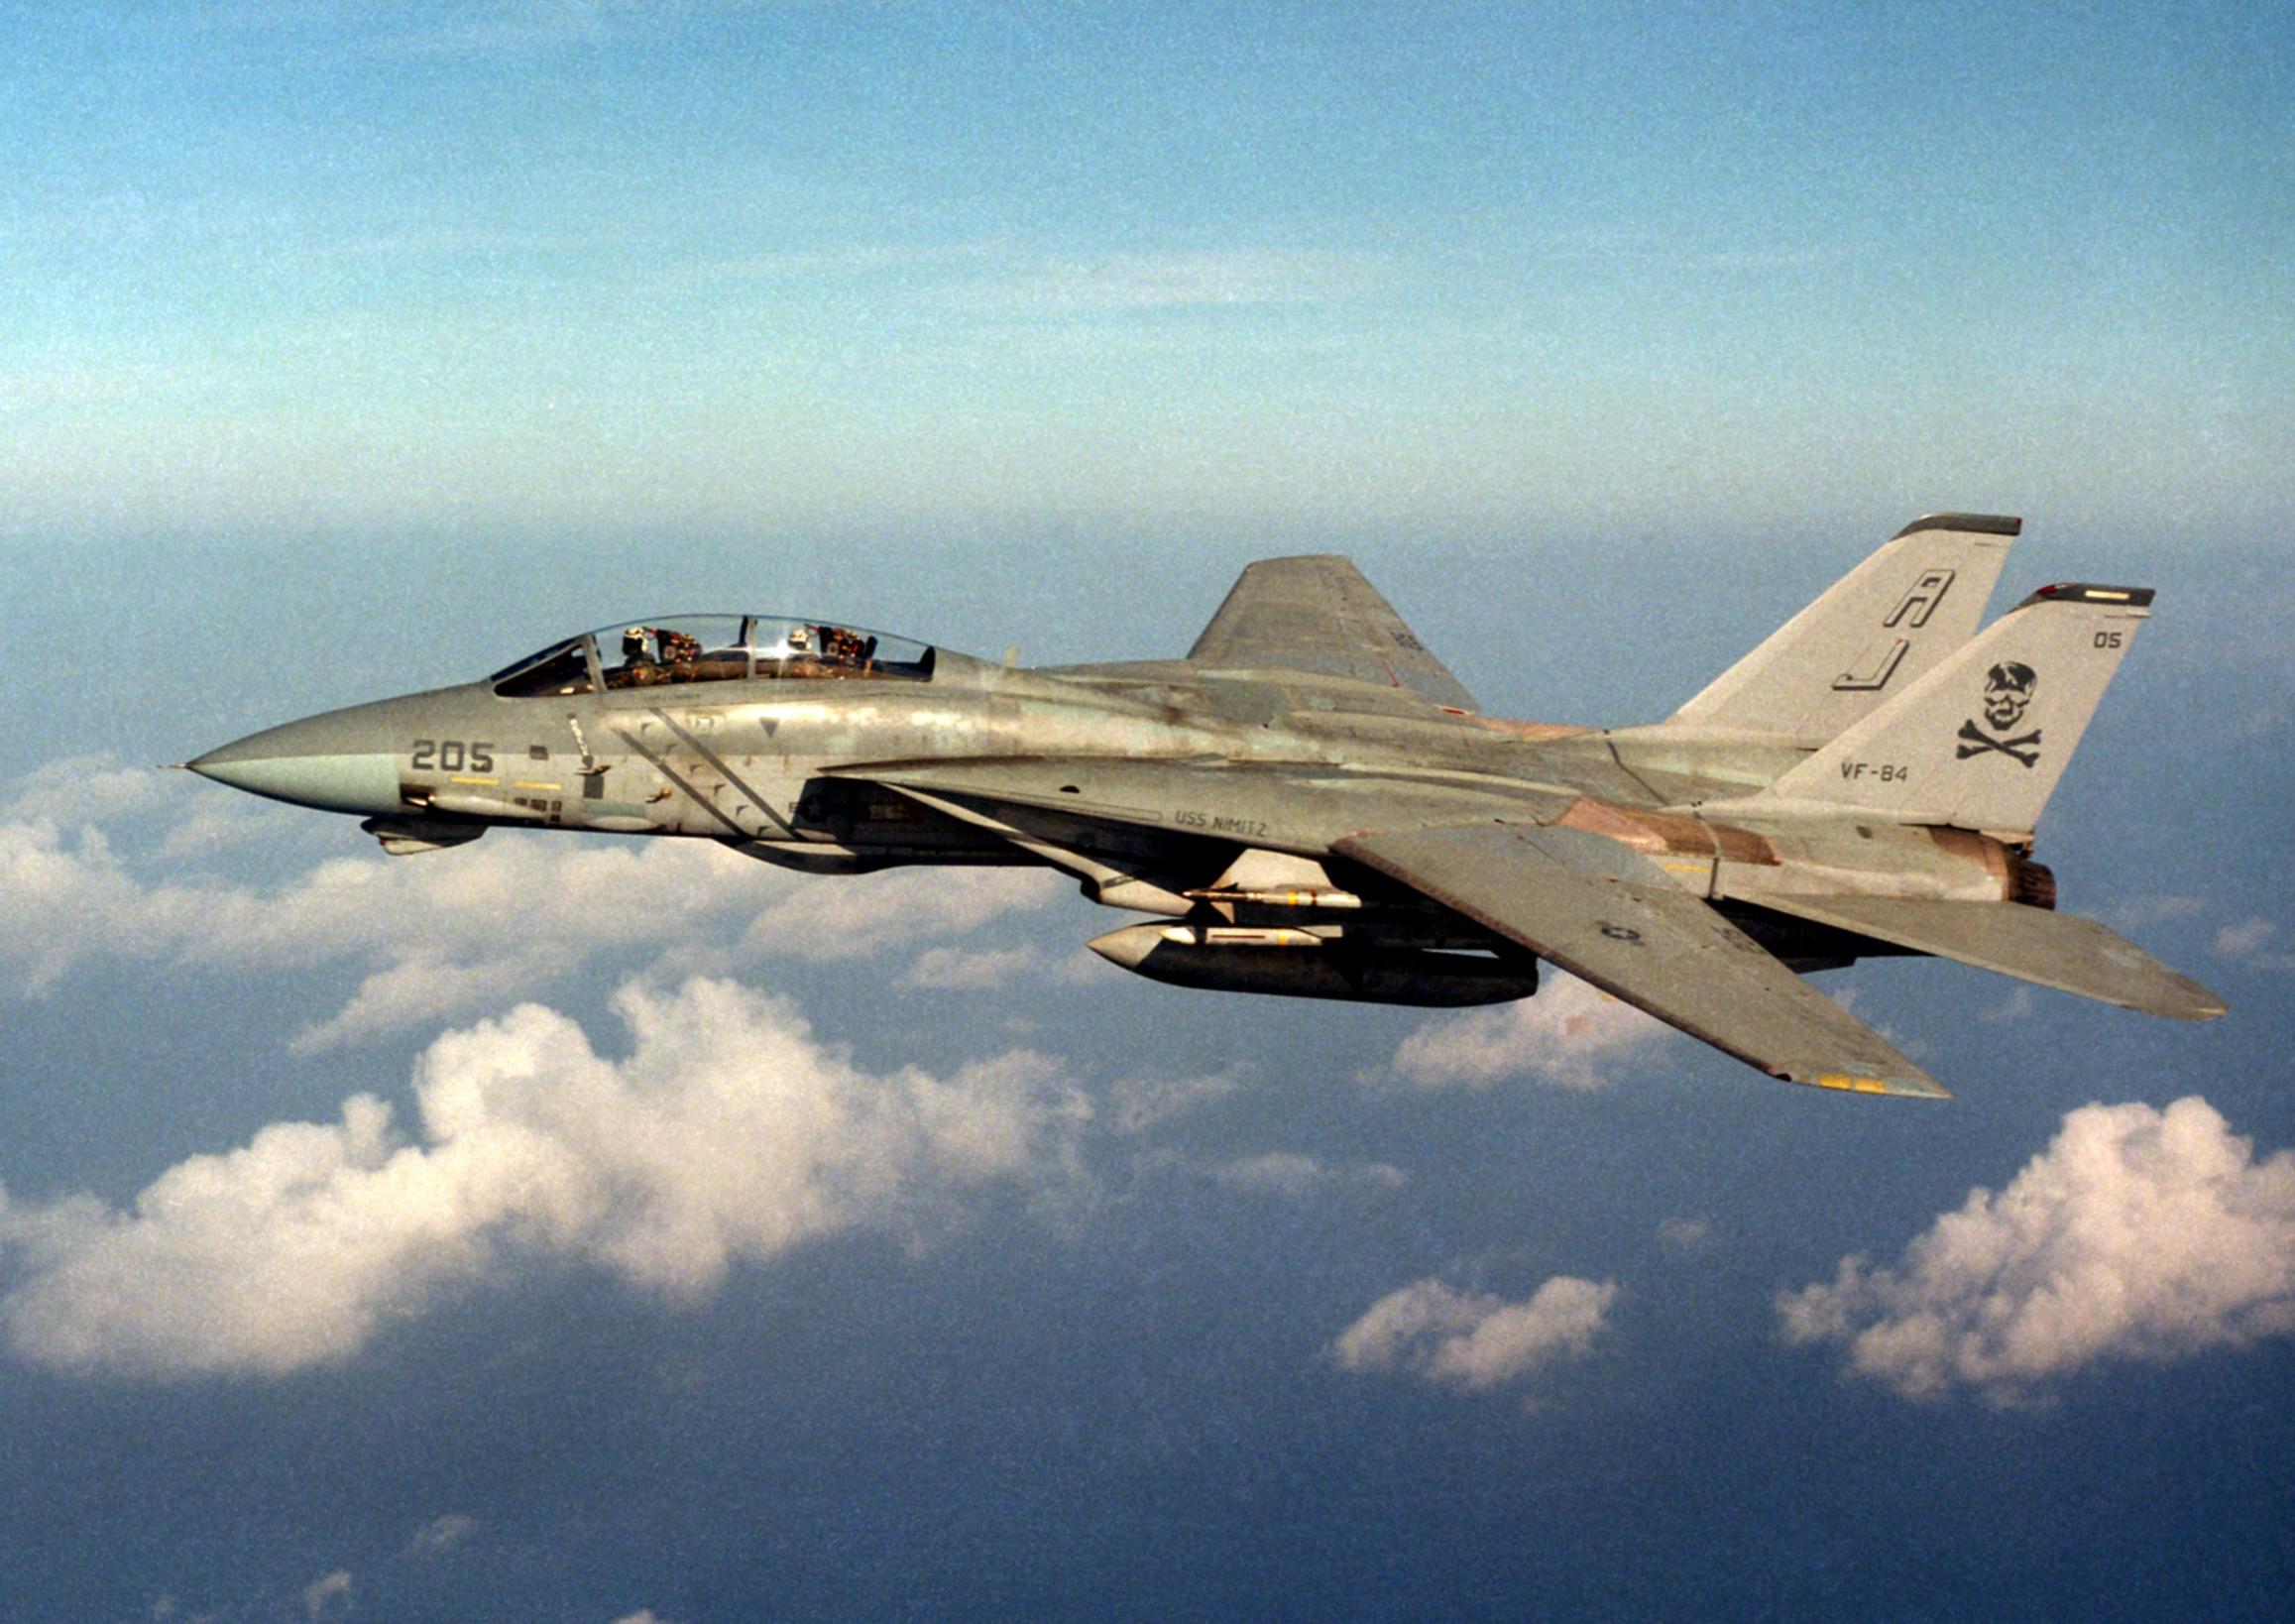 File:F-14A Tomcat of VF-84 in flight in 1986.jpg ...